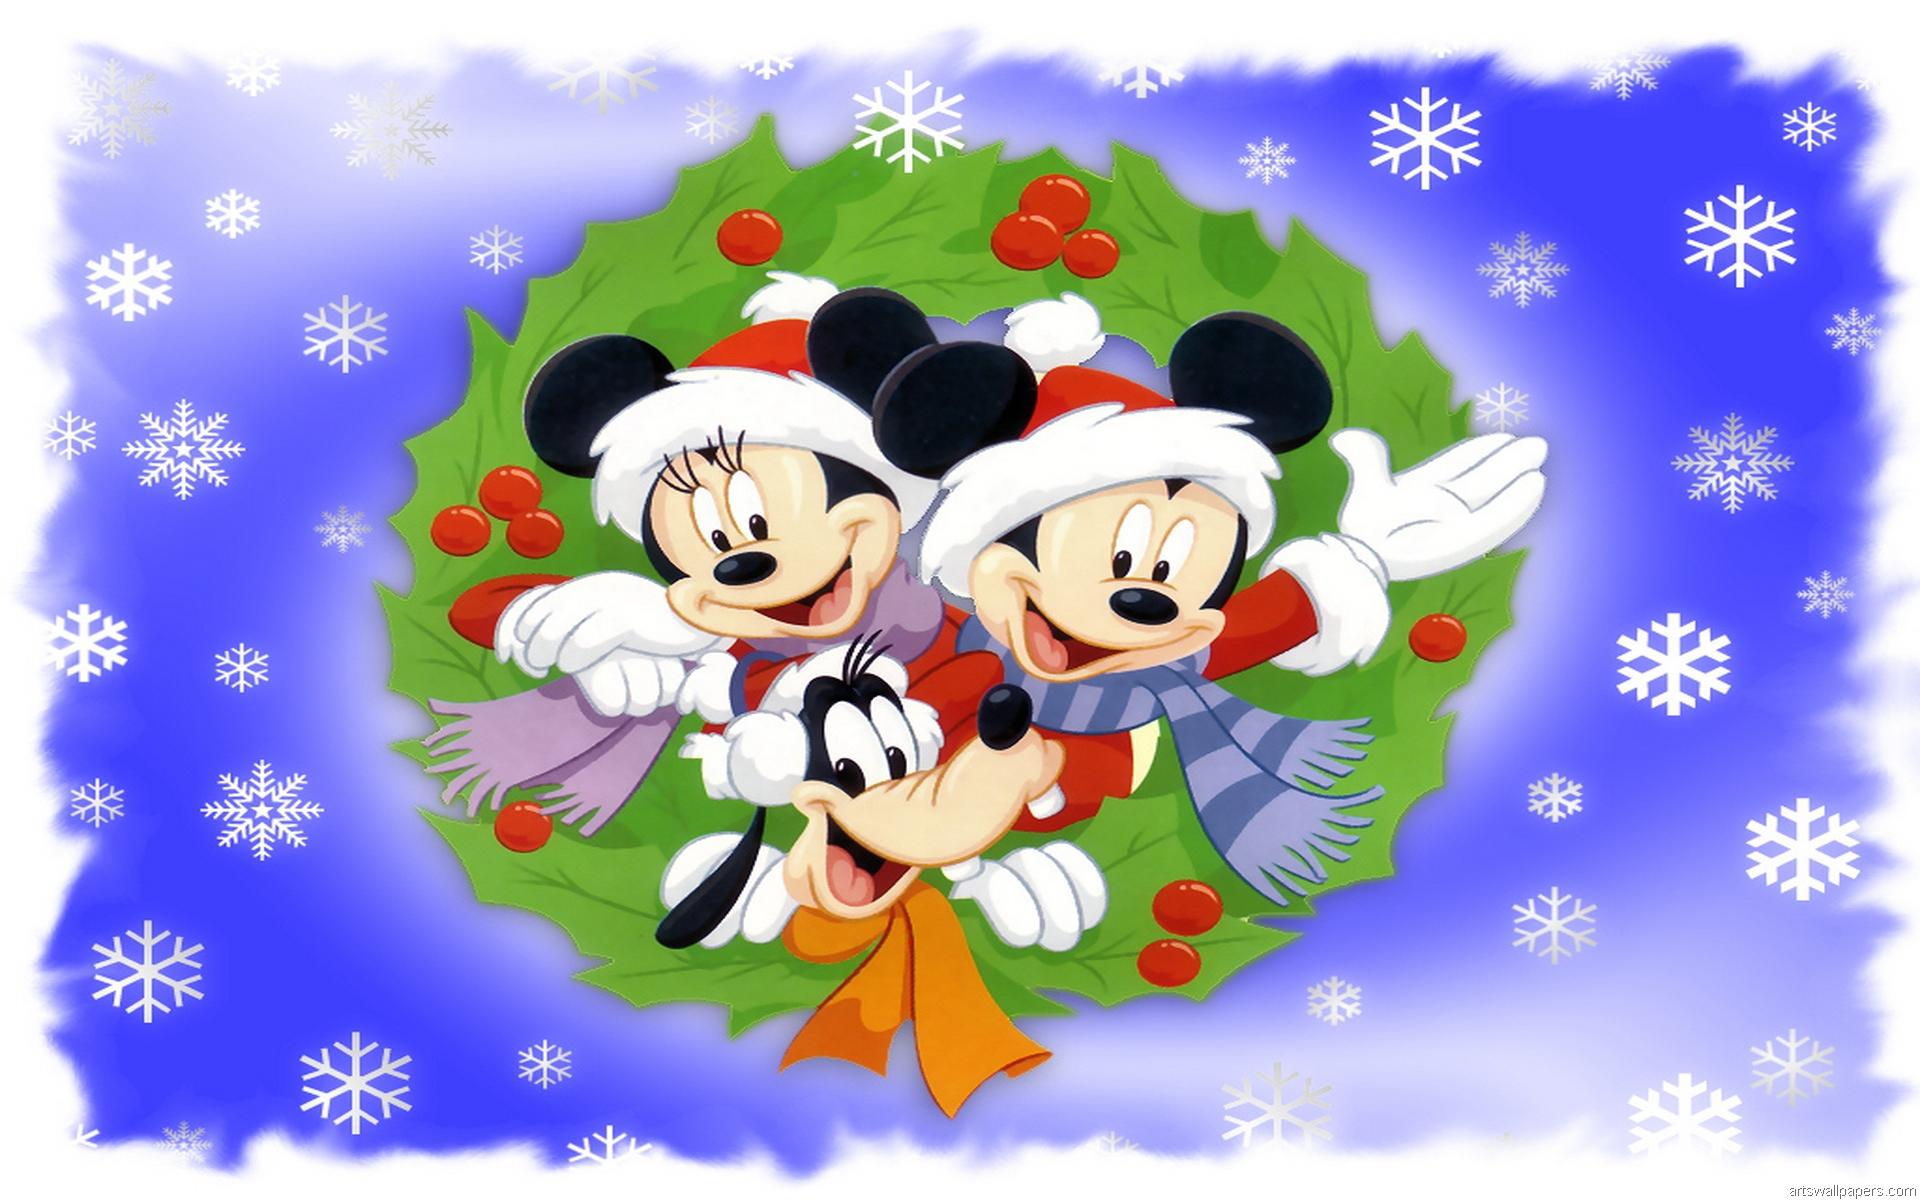 disney christmas wallpaper desktop   wwwwallpapers in hdcom 1920x1200